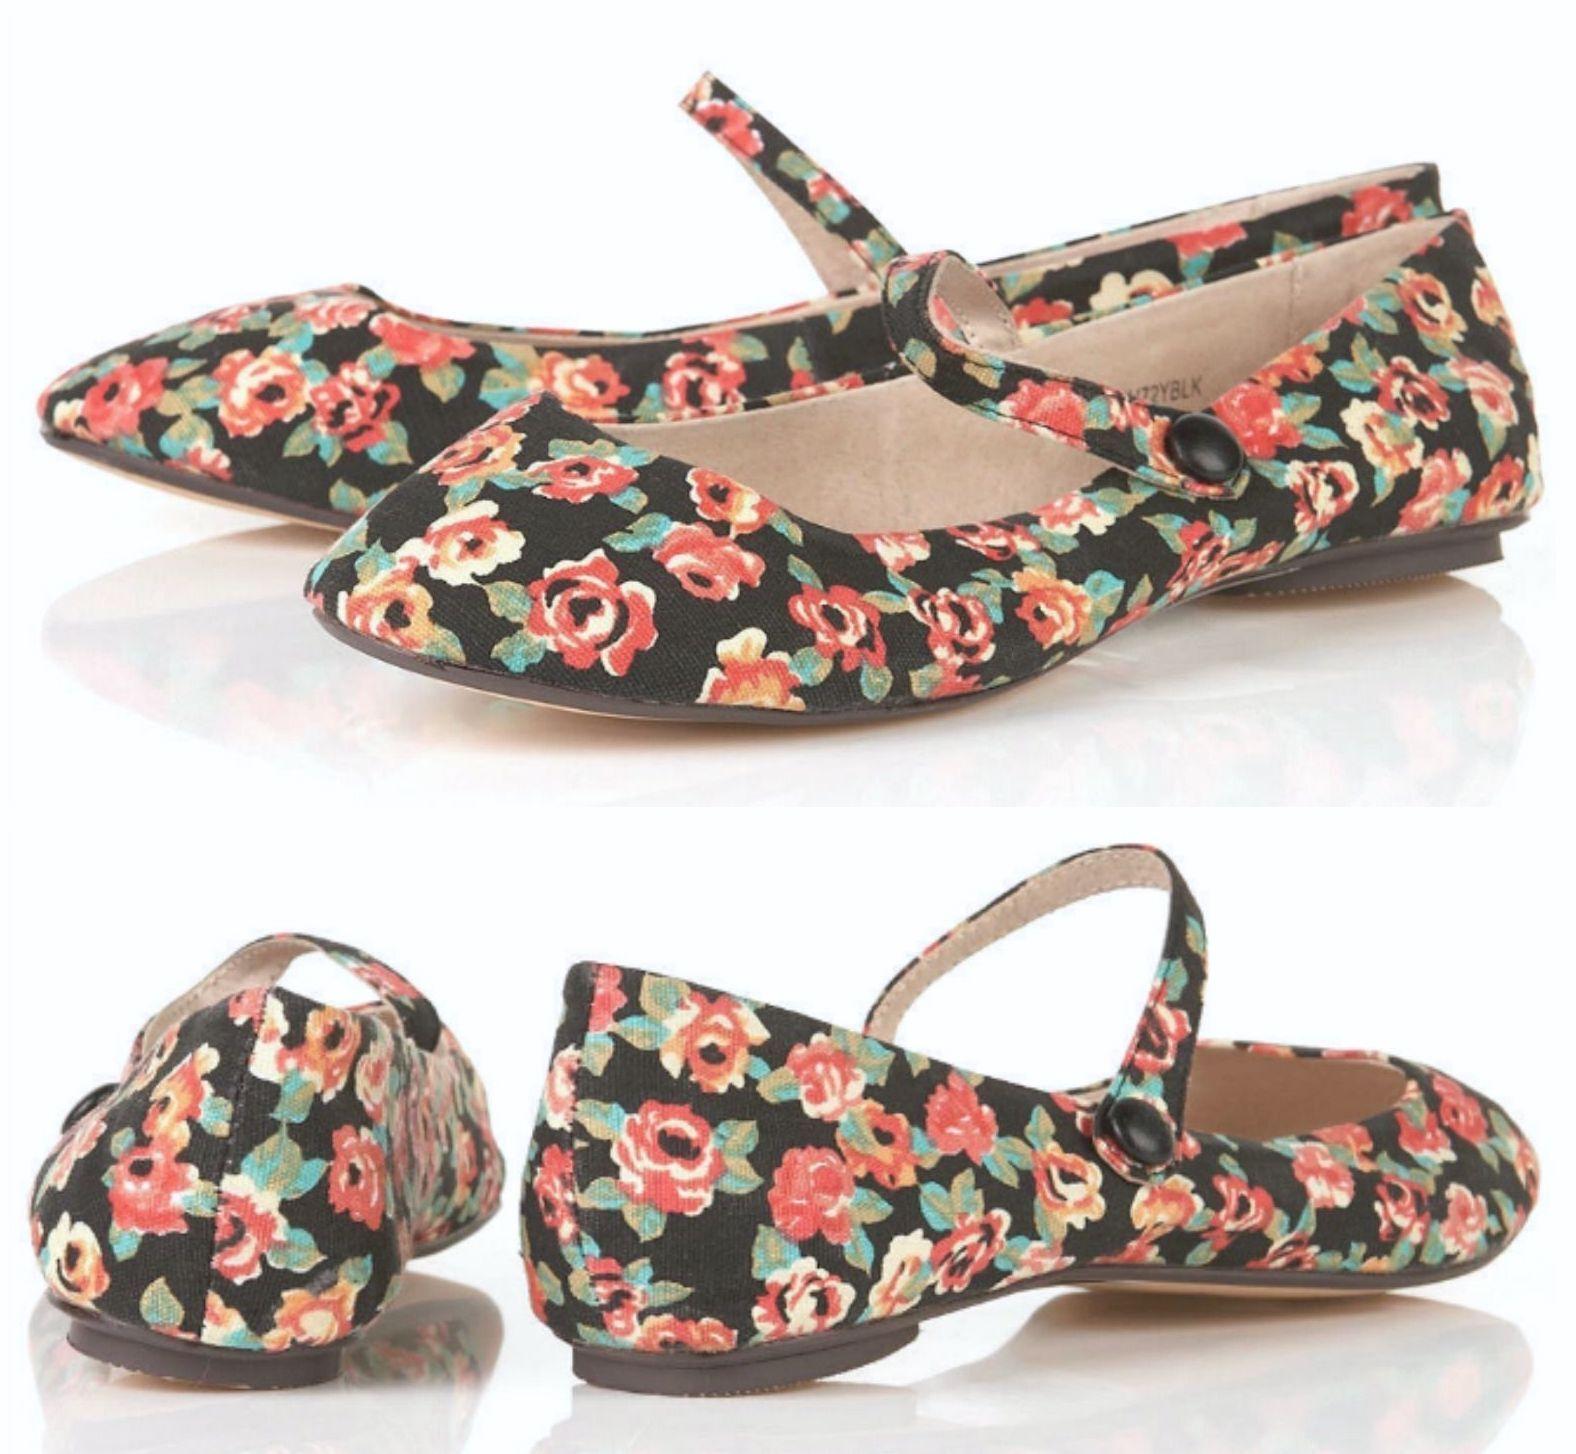 TOPSHOP BLACK DITSY FLORAL PRINT FLAT CANVAS BALLET PUMPS Schuhe BALLERINAS NEU